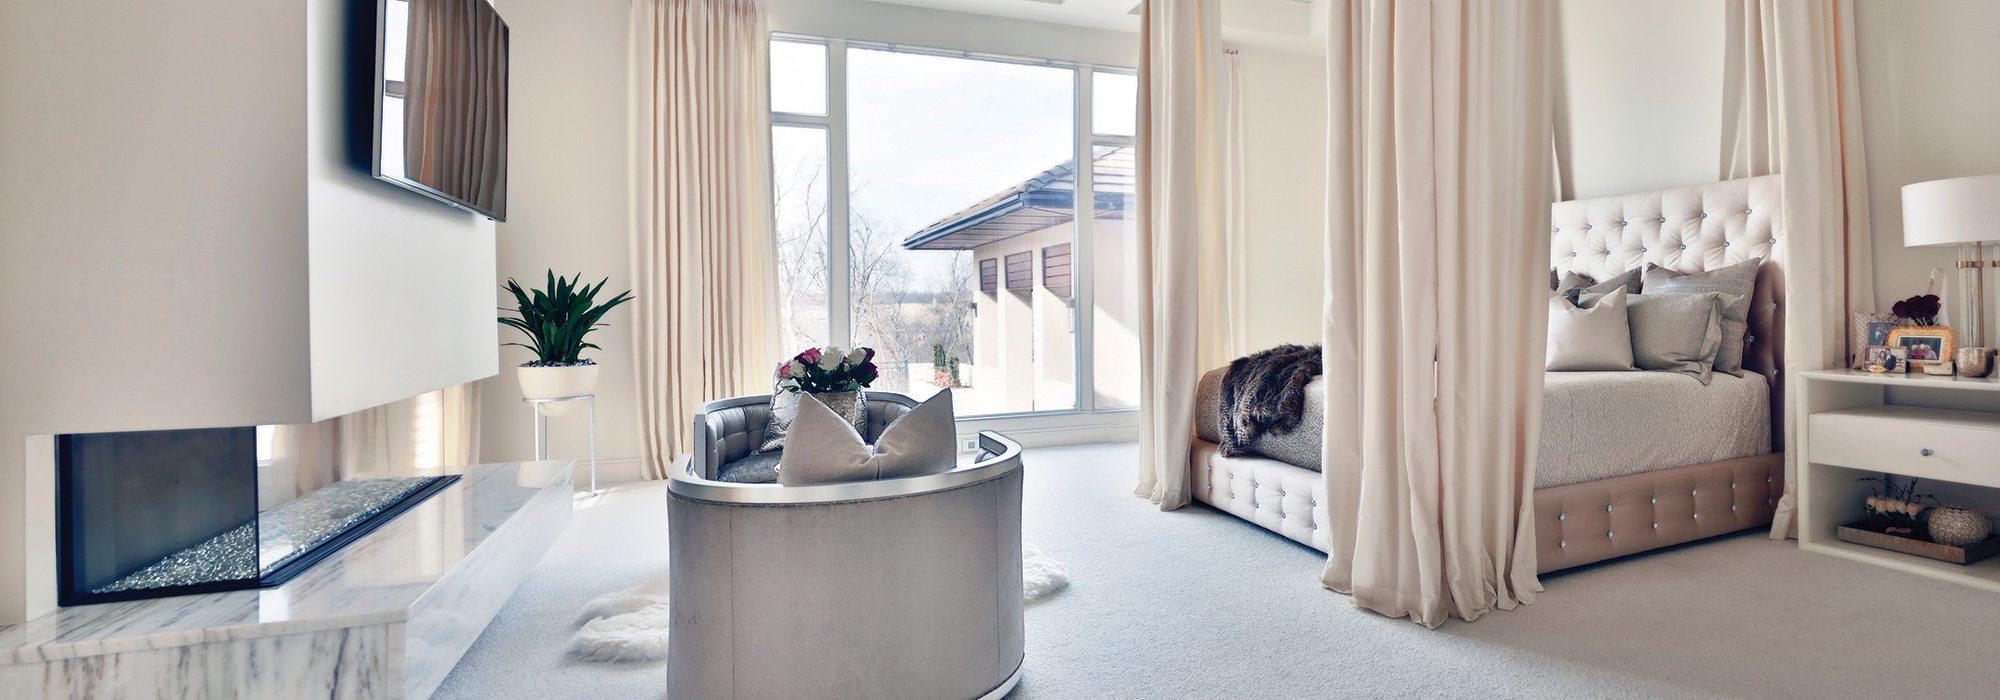 417 Home Design Awards 2015 - Master Suite Winner